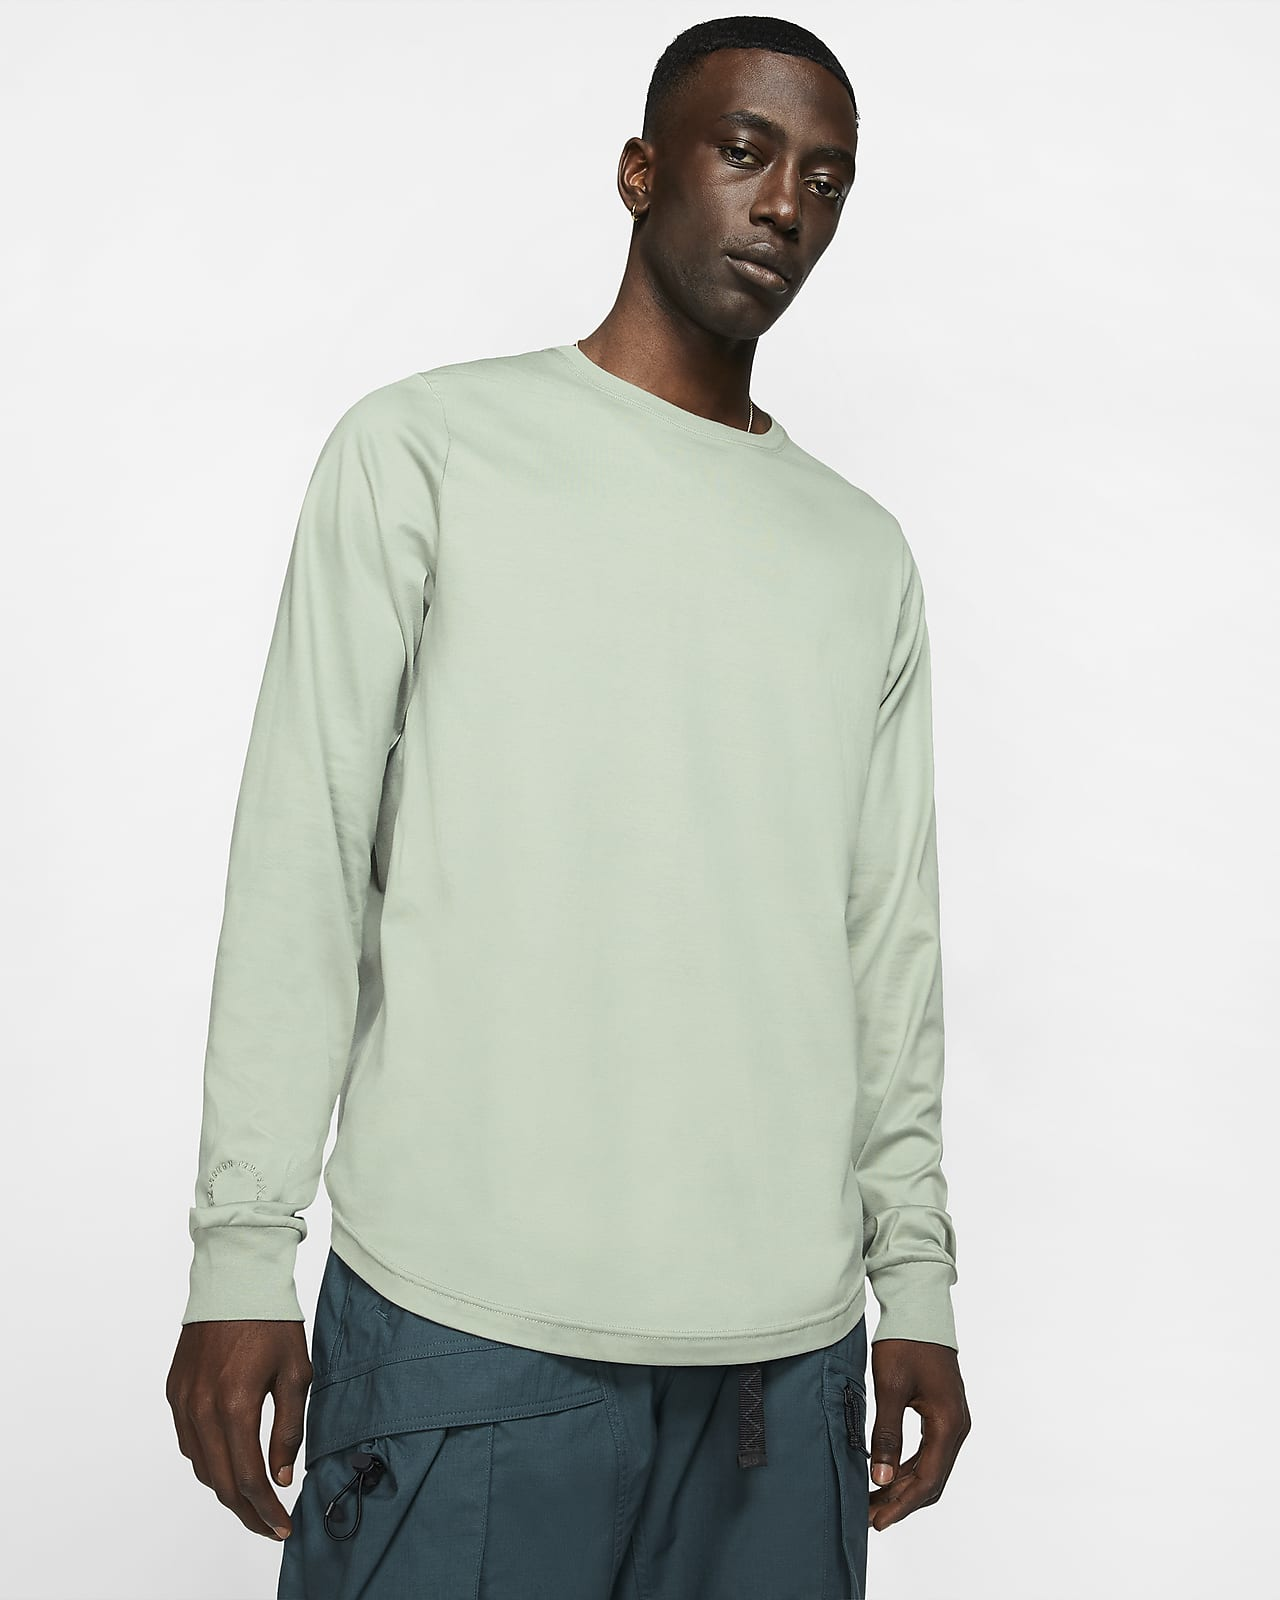 LeBron x John Elliott Men's T-Shirt